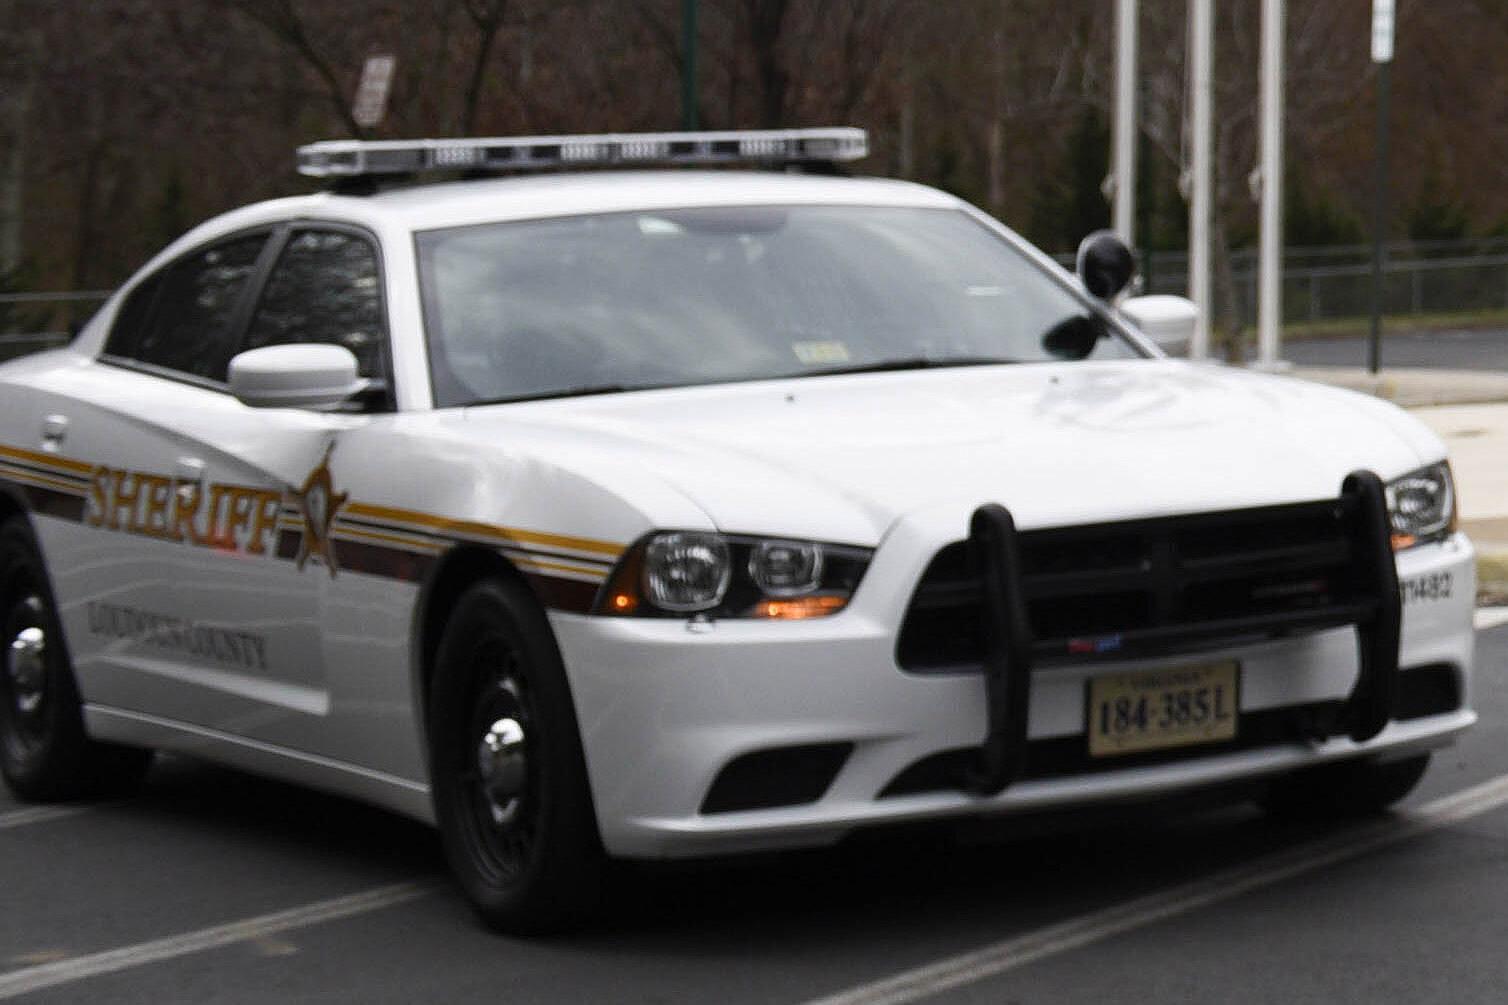 loco sheriff AP e1595761018601.'